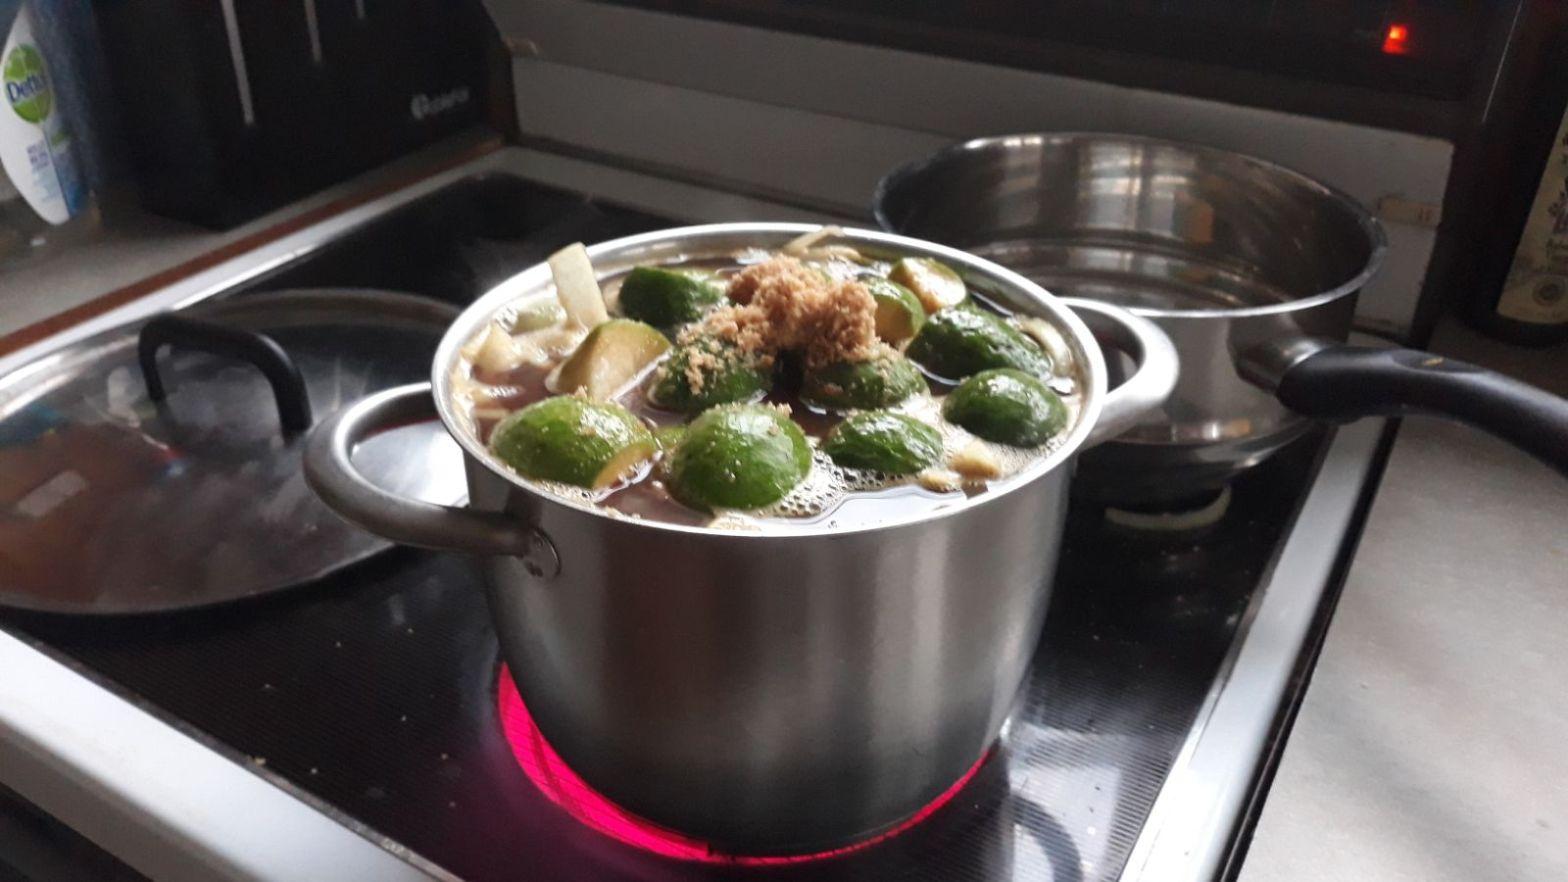 Food: Autumn's bounty and feijoa relish